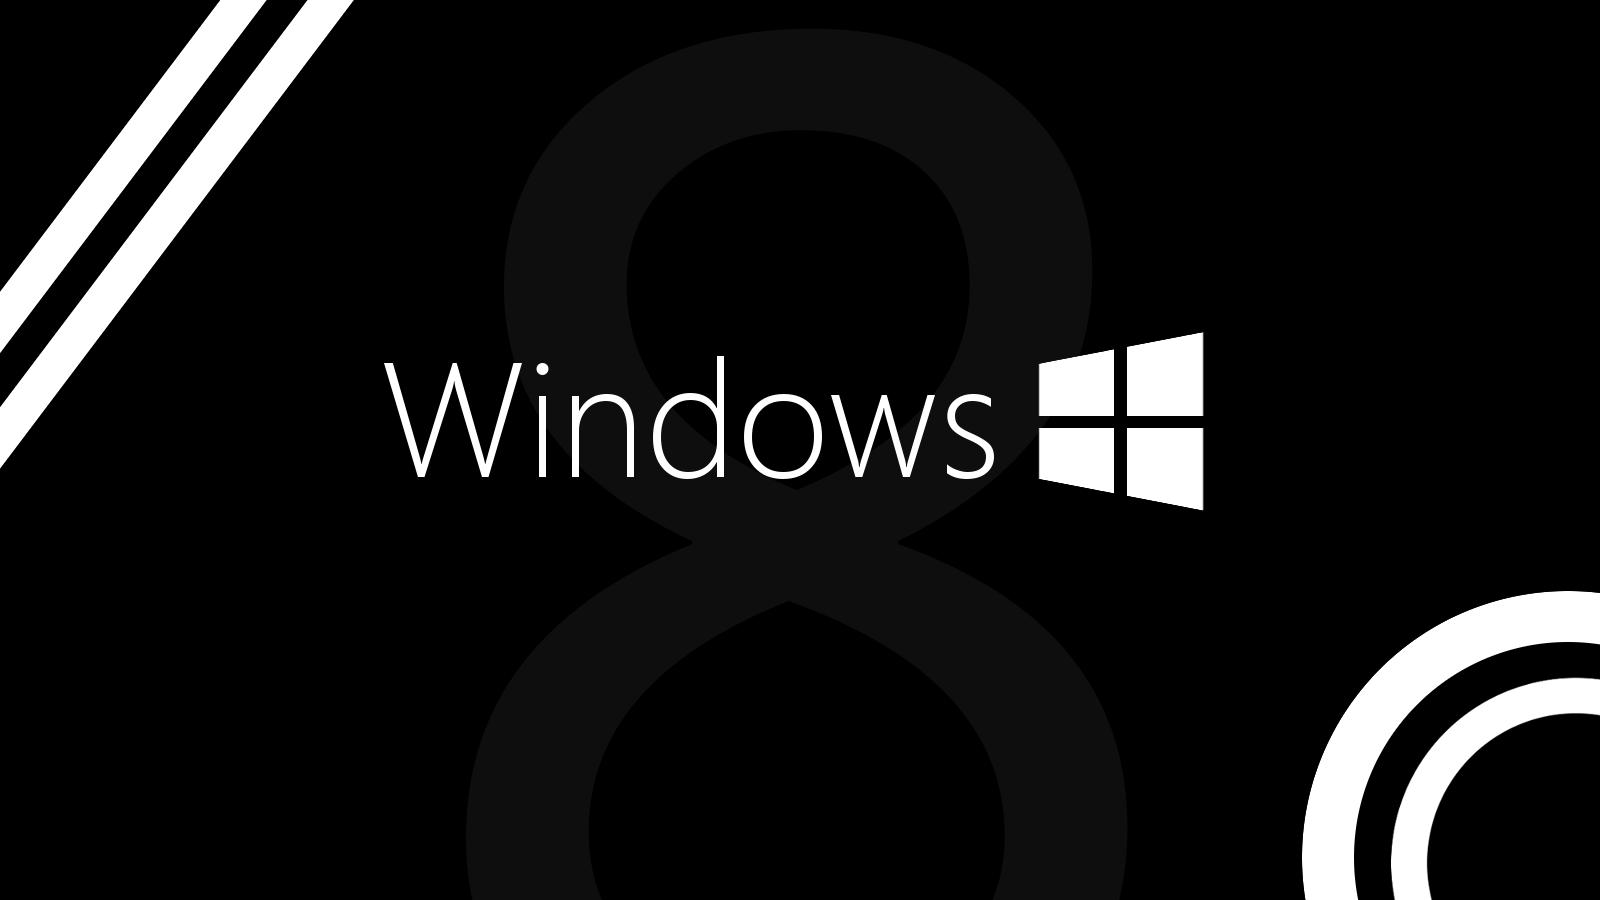 logo windows 8 black - photo #6